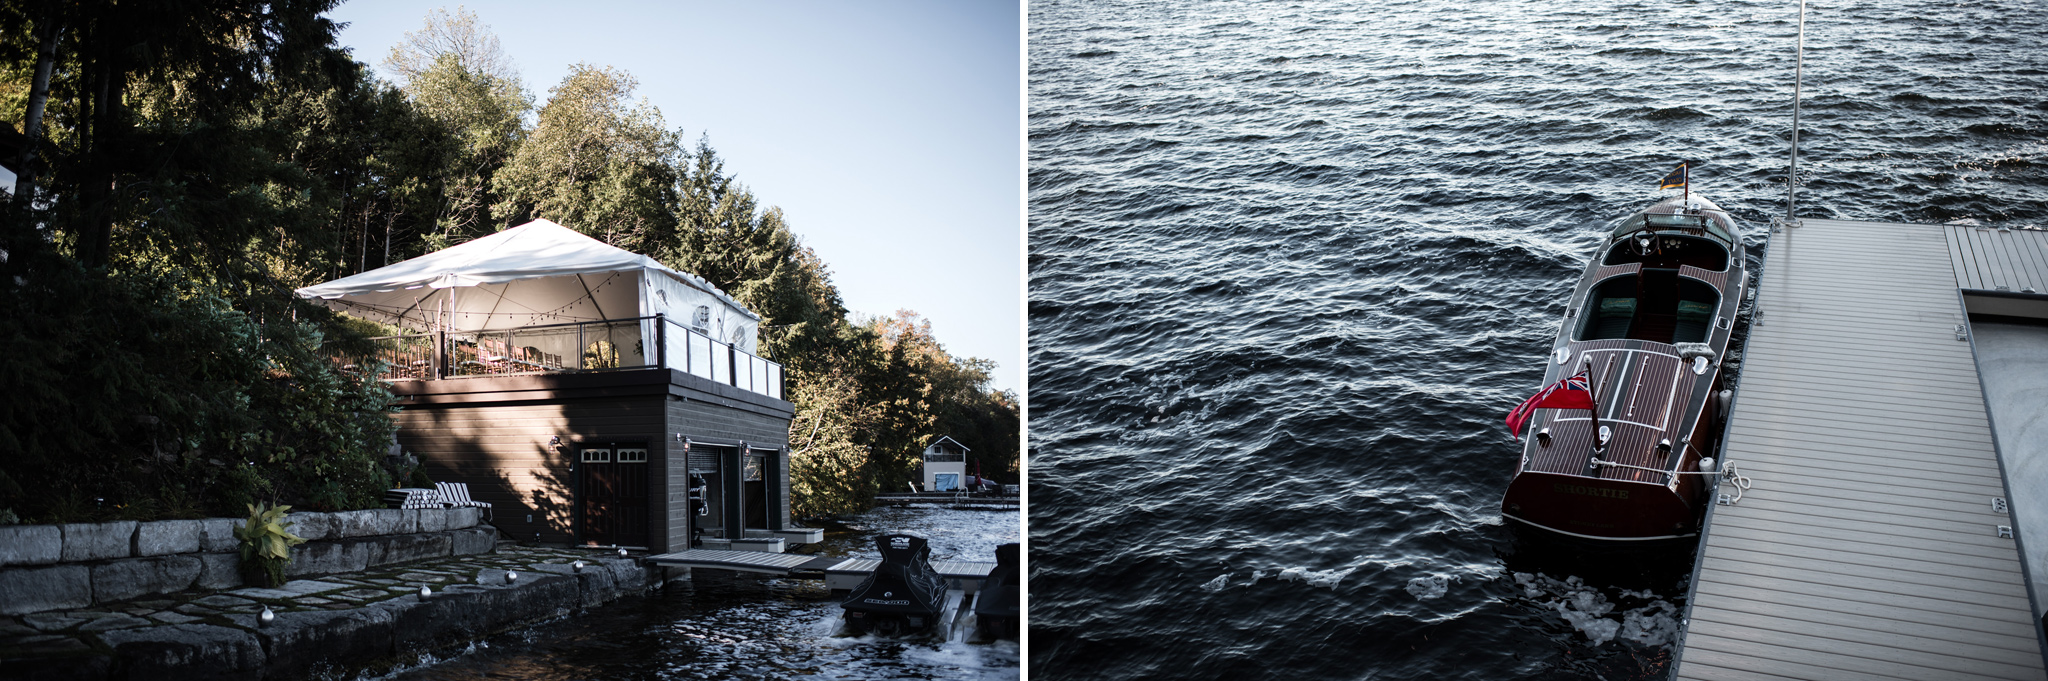 083-ontario-cottage-wedding-photographer-toronto-outdoors.jpg